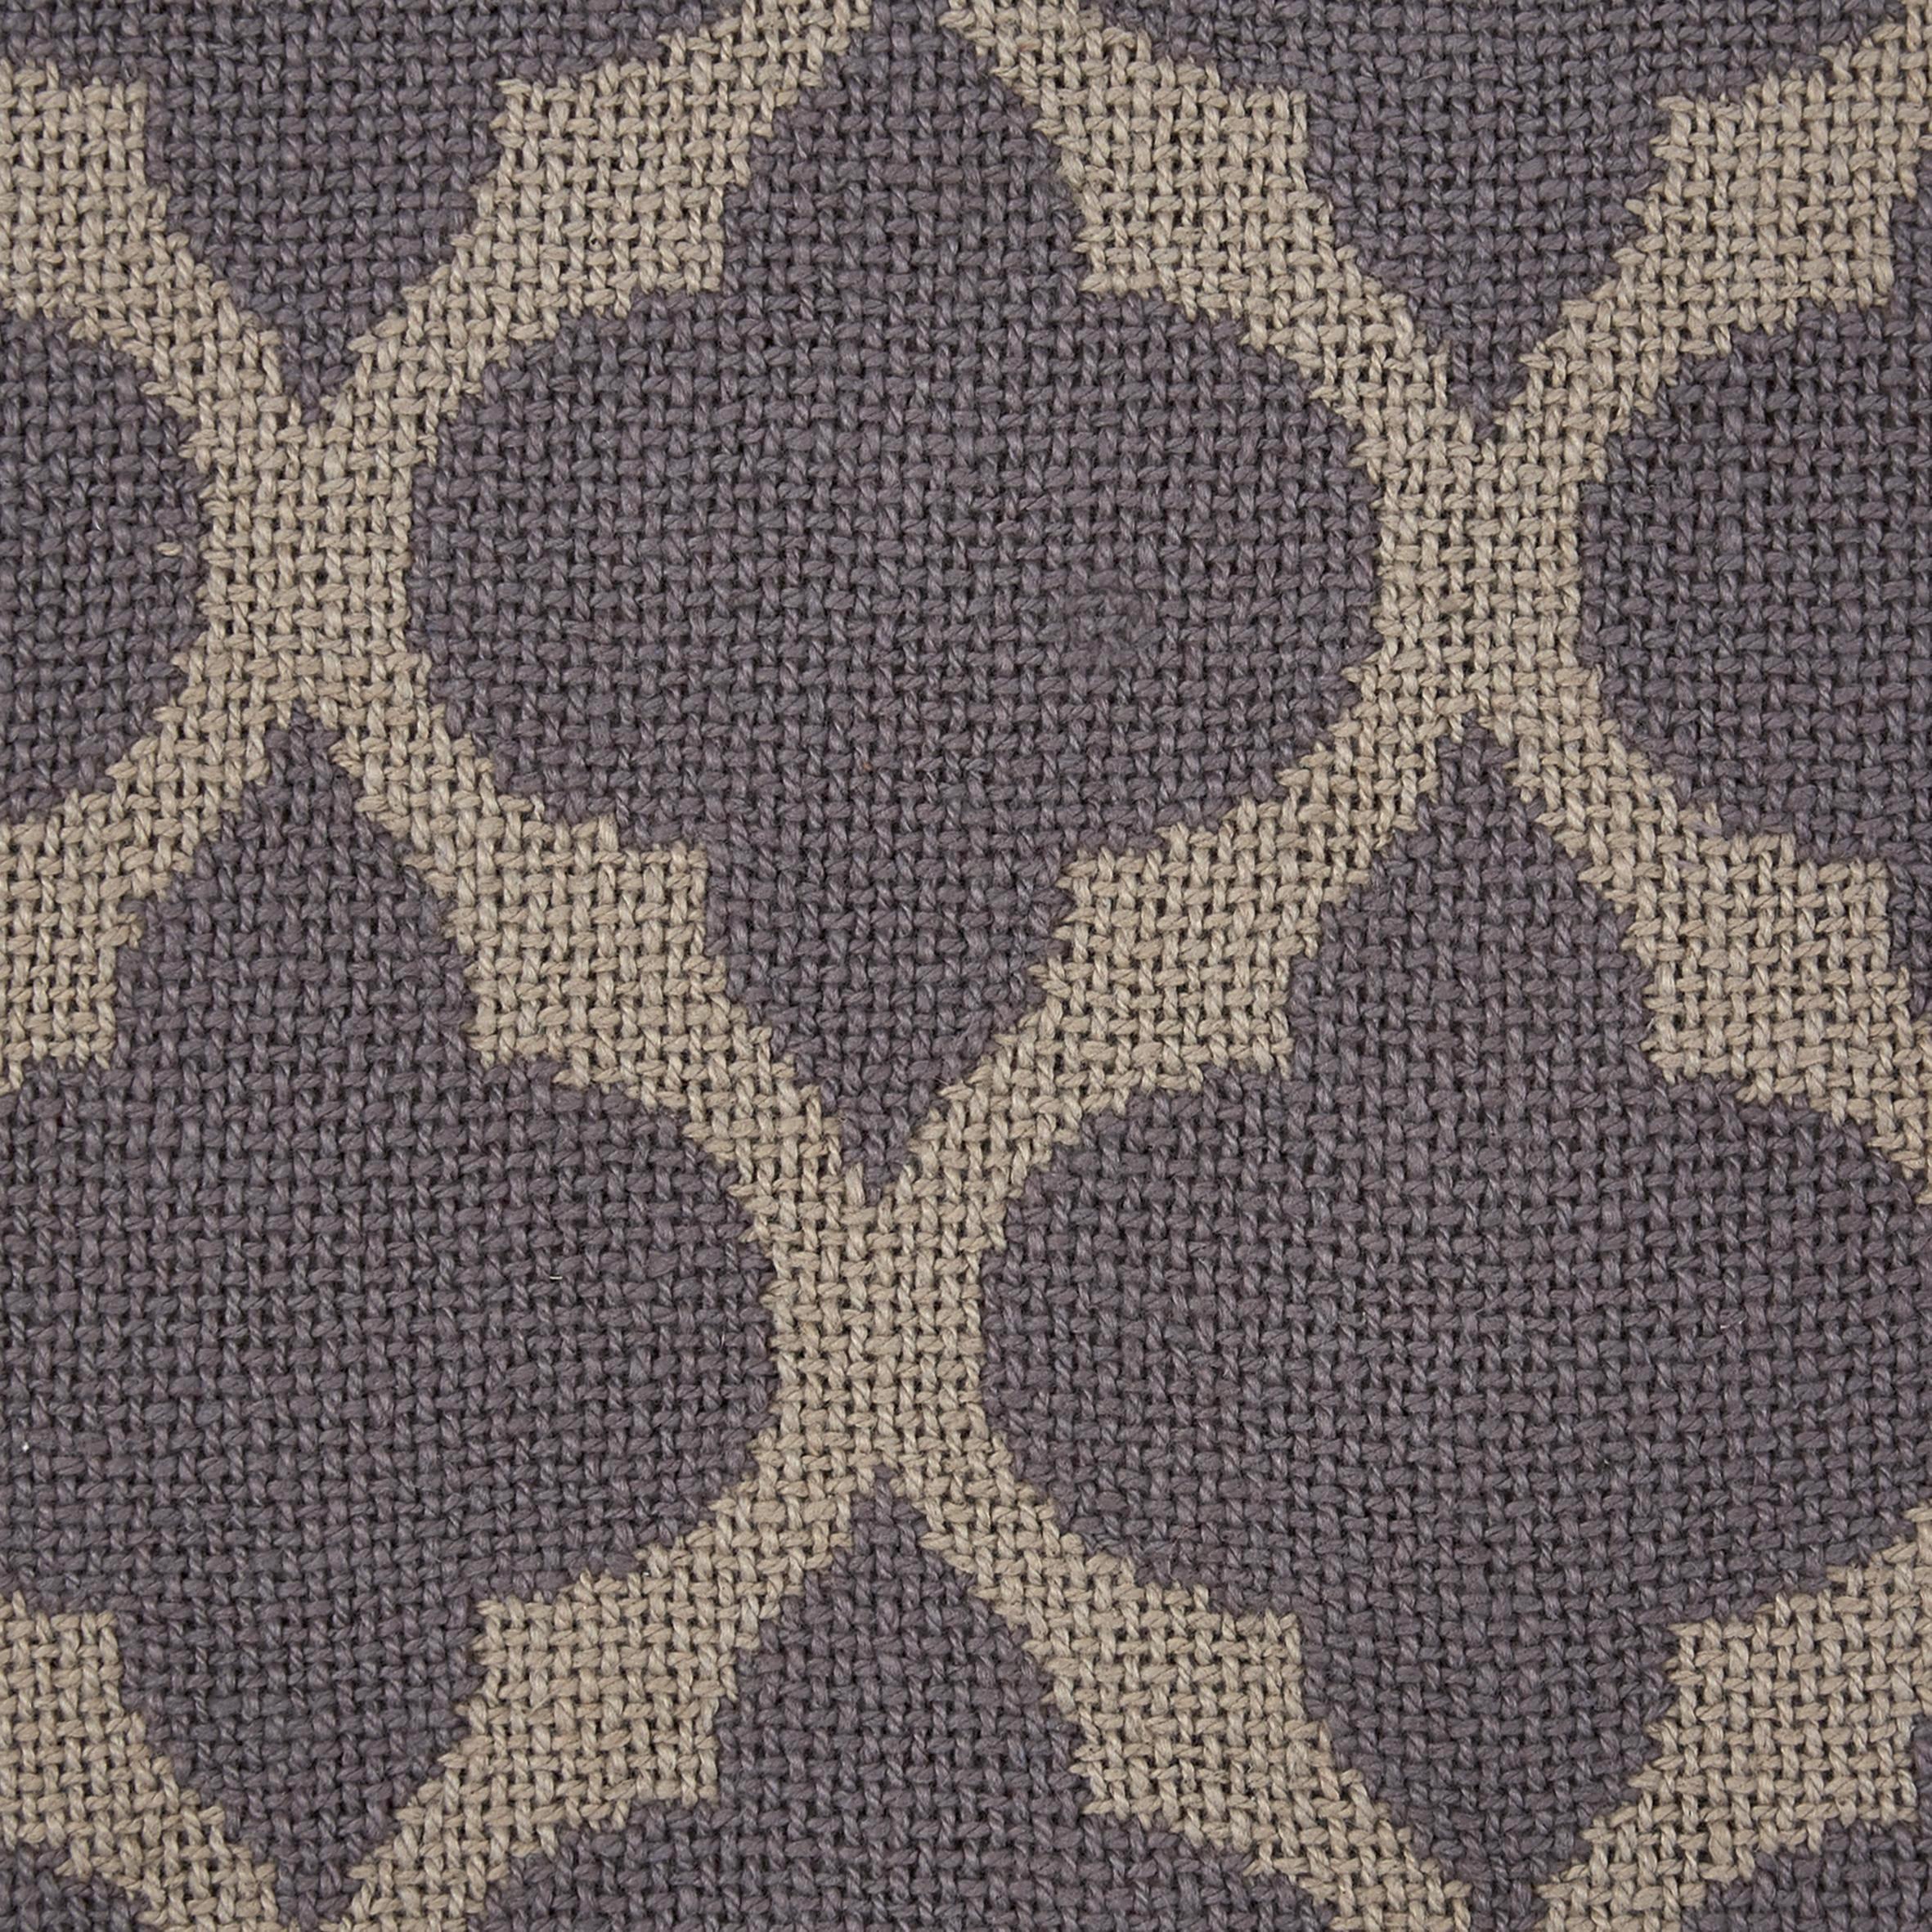 Baumwolldecke Ornament 130x170cm - Braun/Grau, MODERN, Textil (130/170cm) - MÖMAX modern living